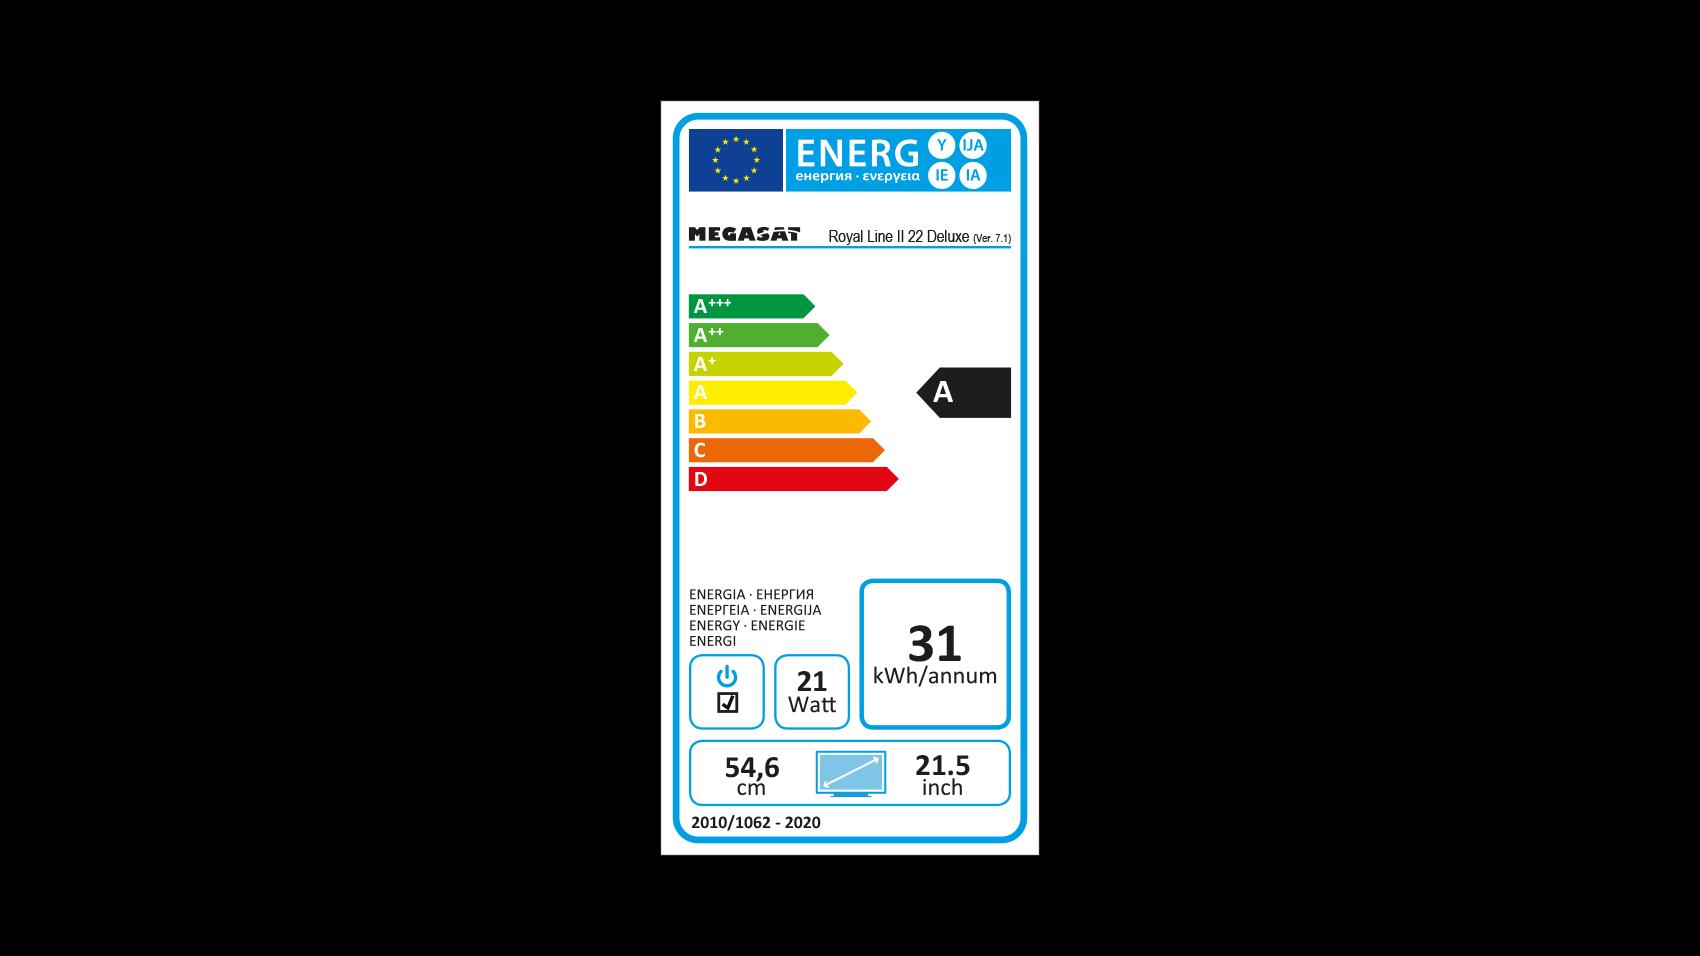 megasat_royal_line_2_22_deluxe_energielabel